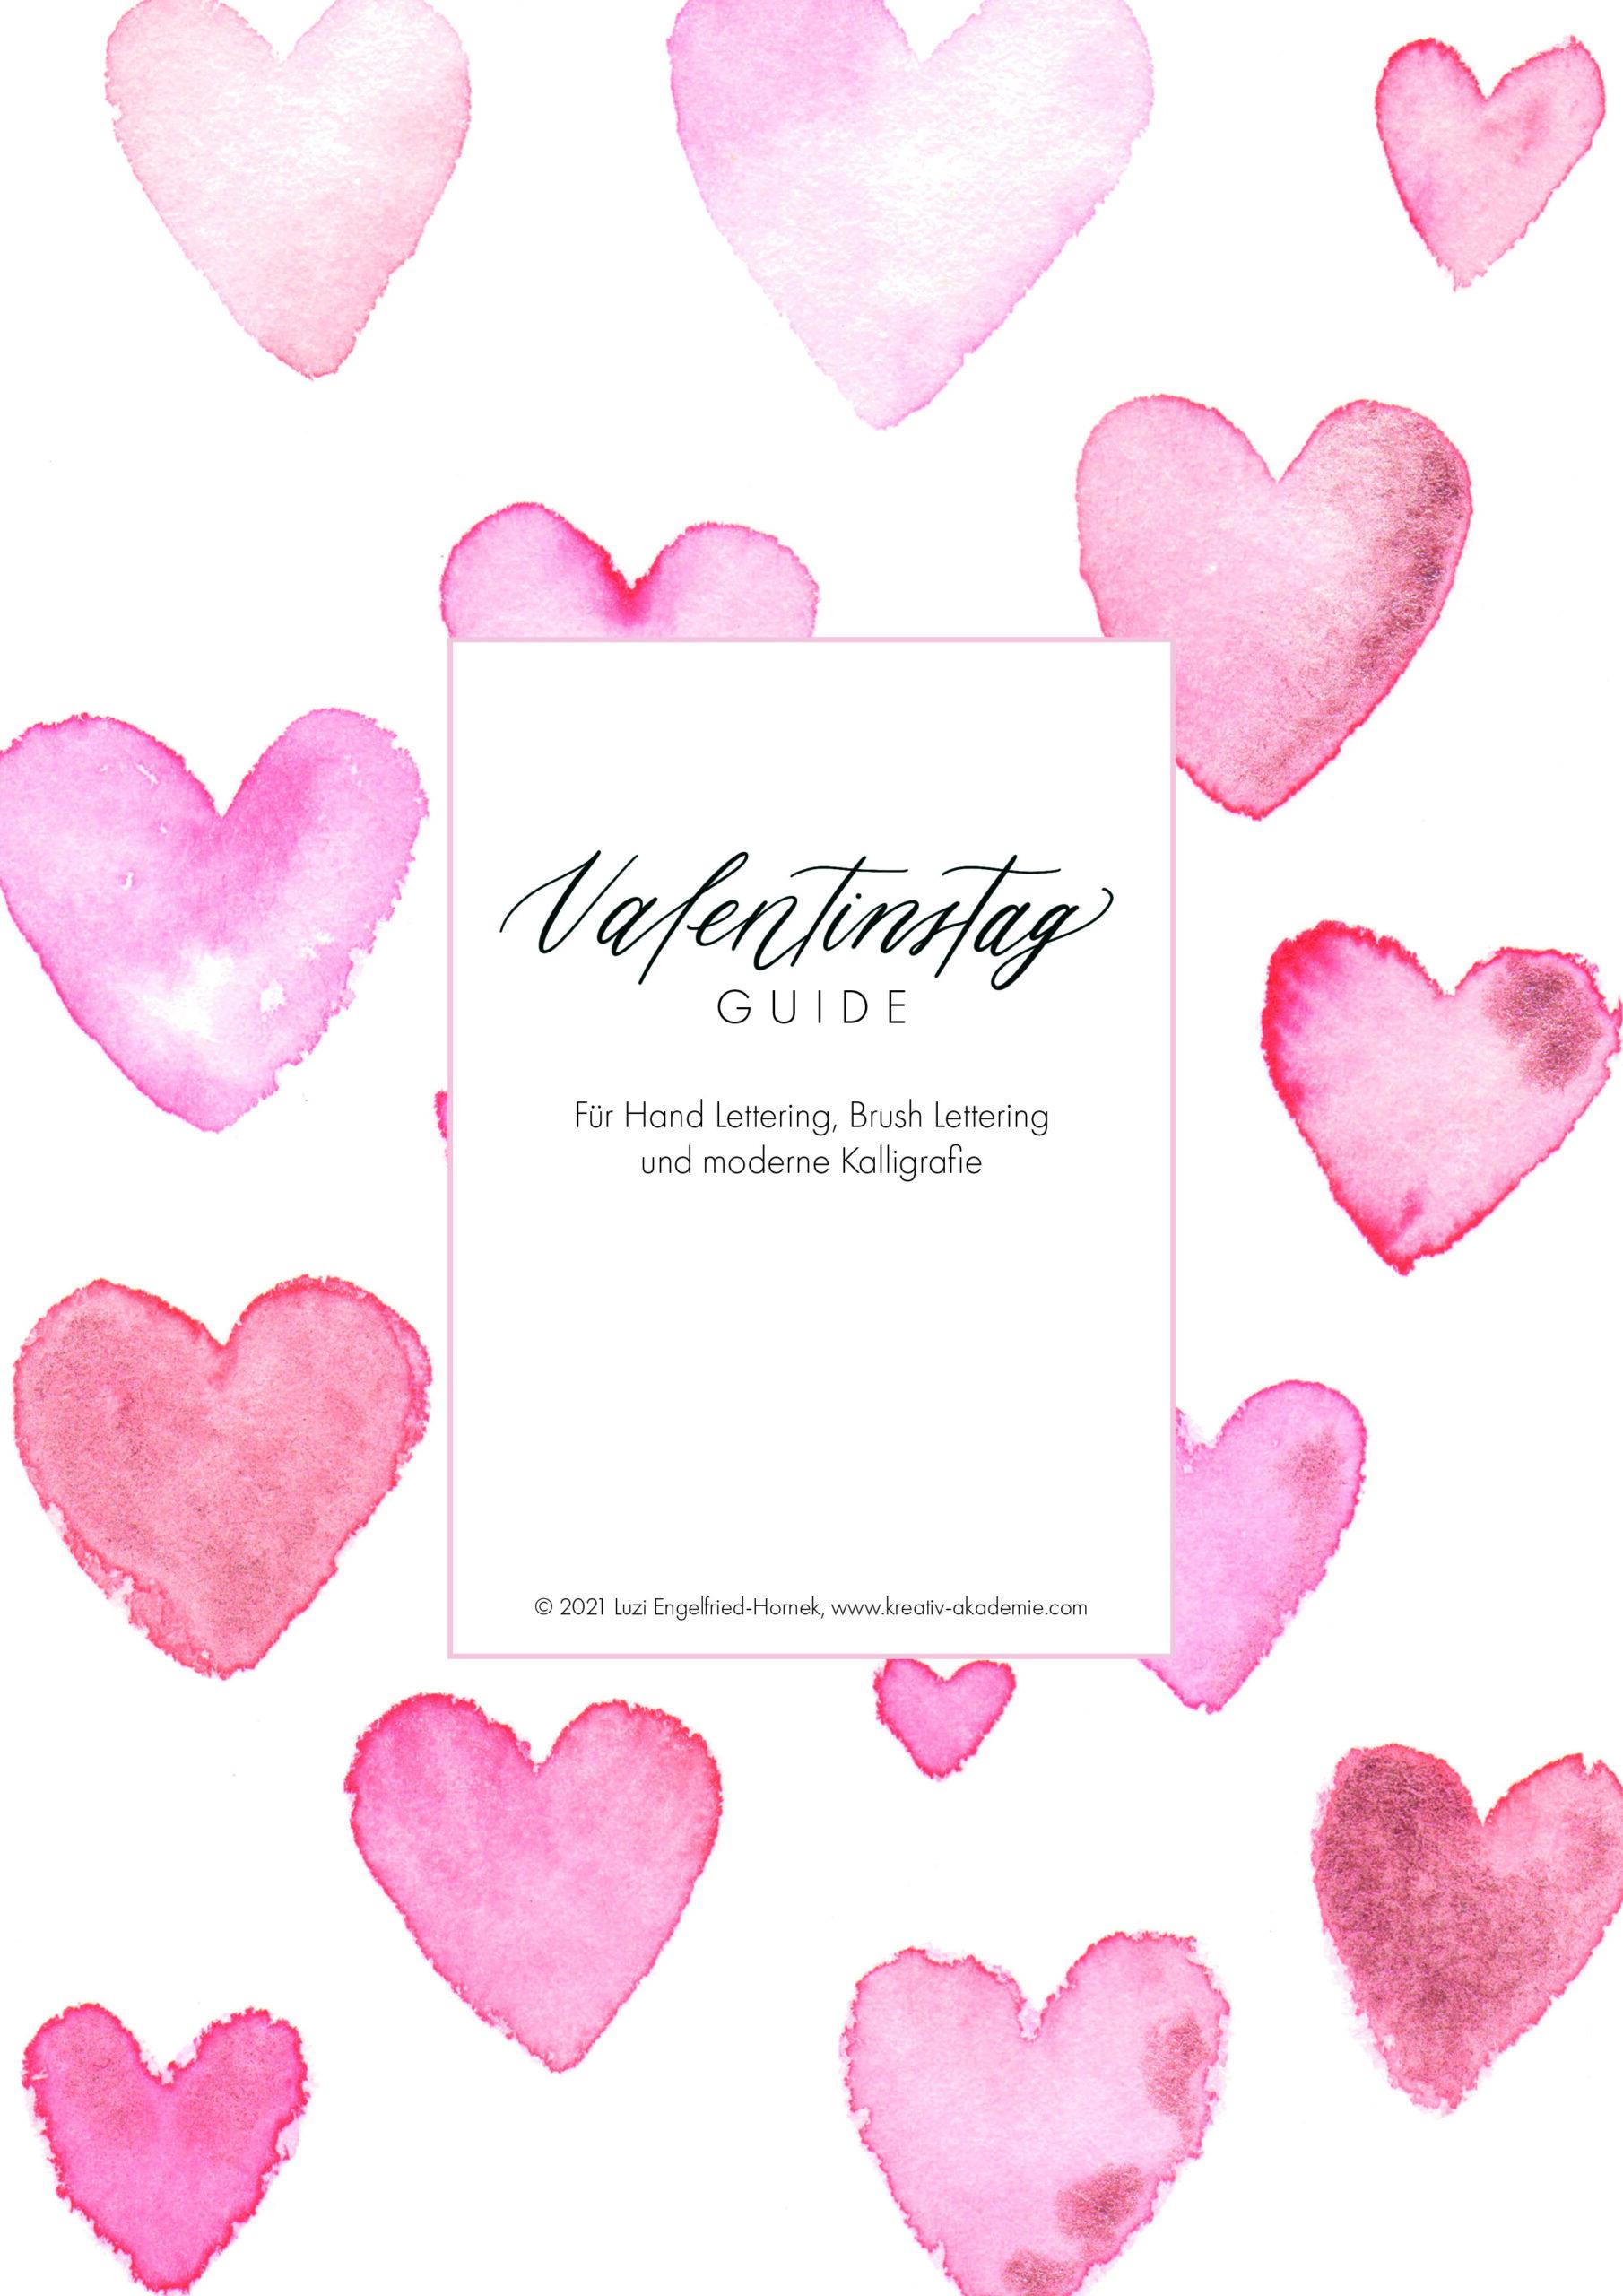 Kalligrafie Guide Valentinstag